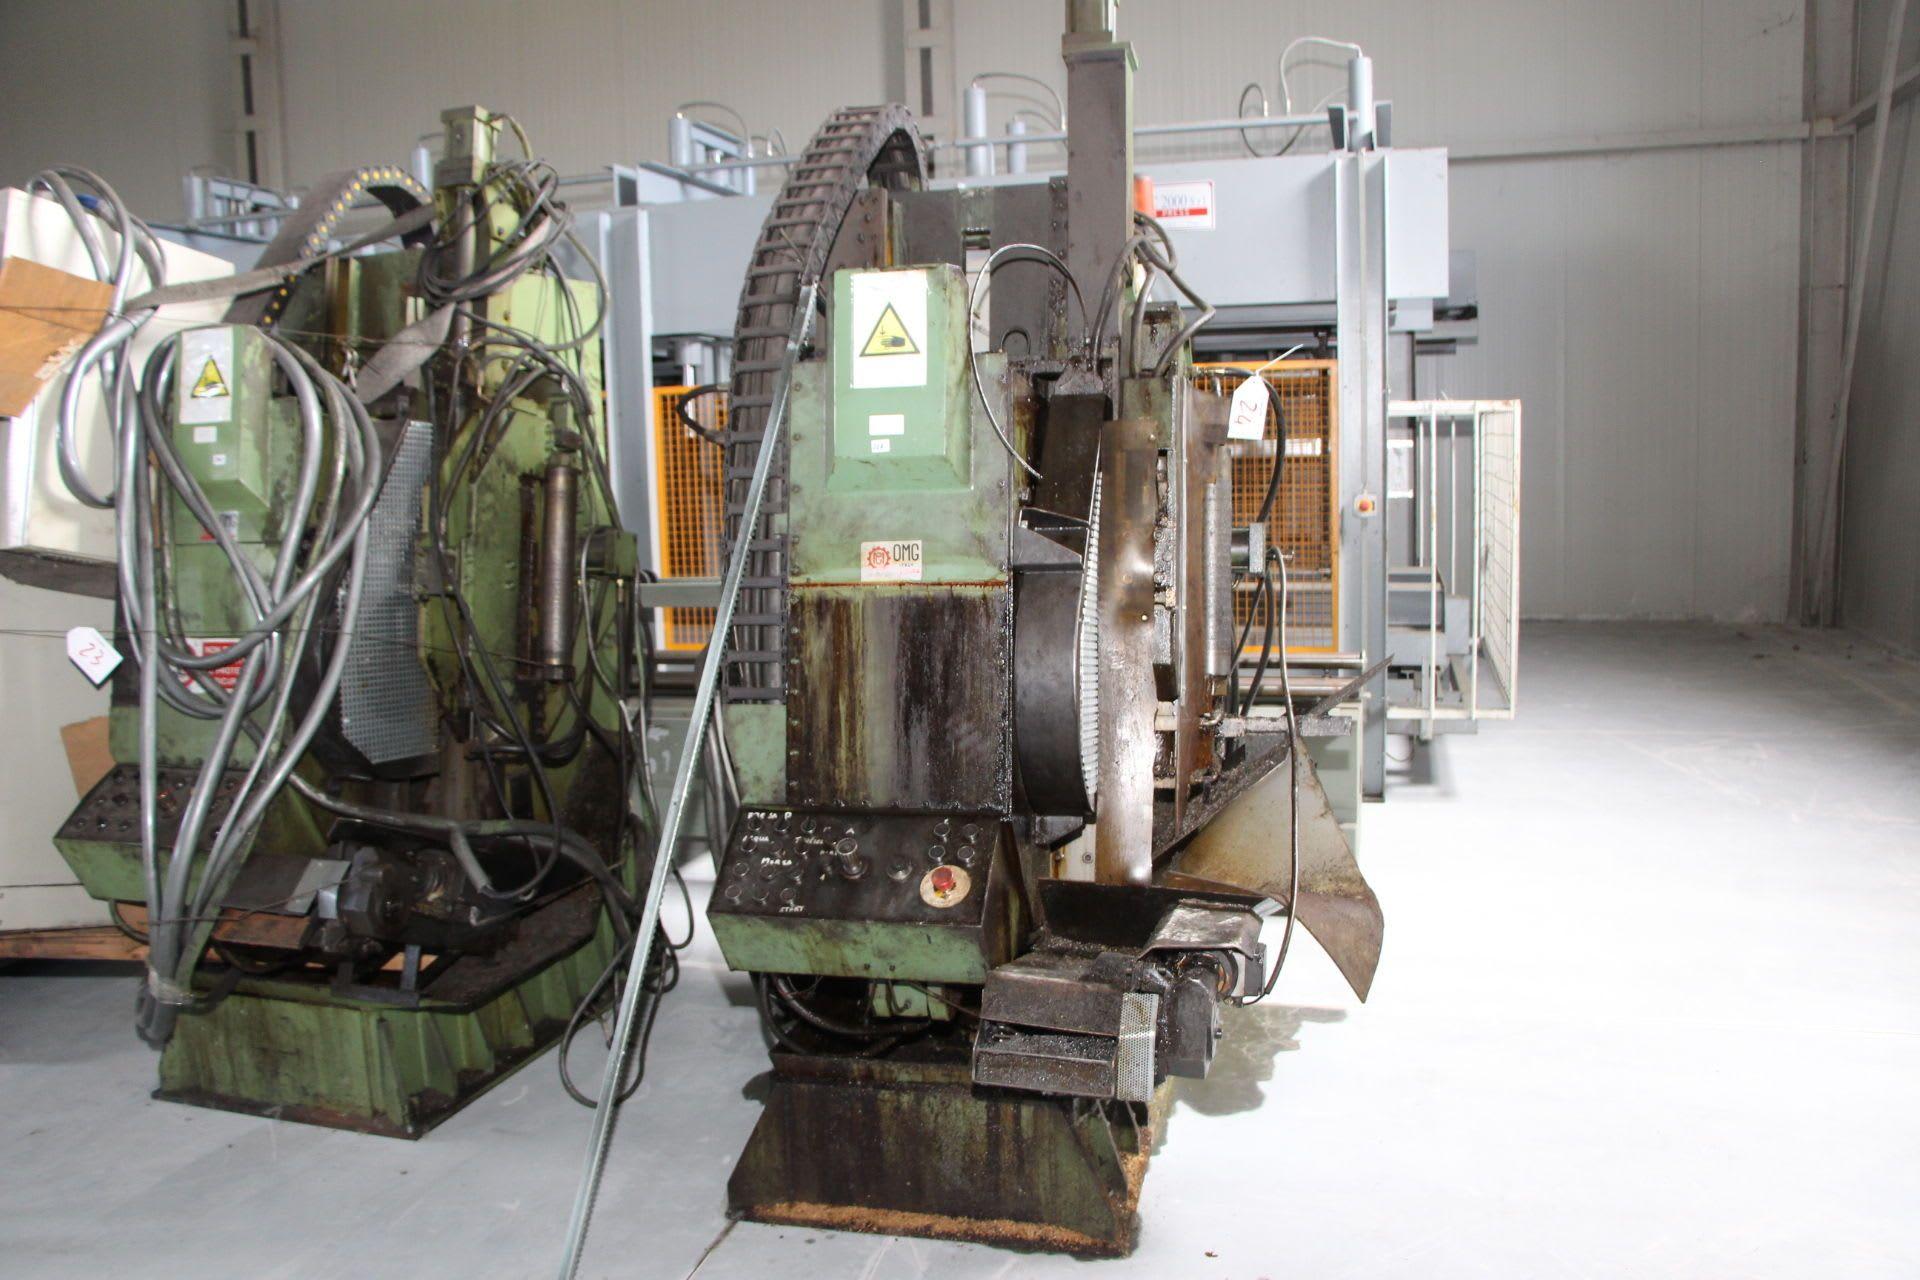 OMG 22 X 22 Abwälzfräsmaschine